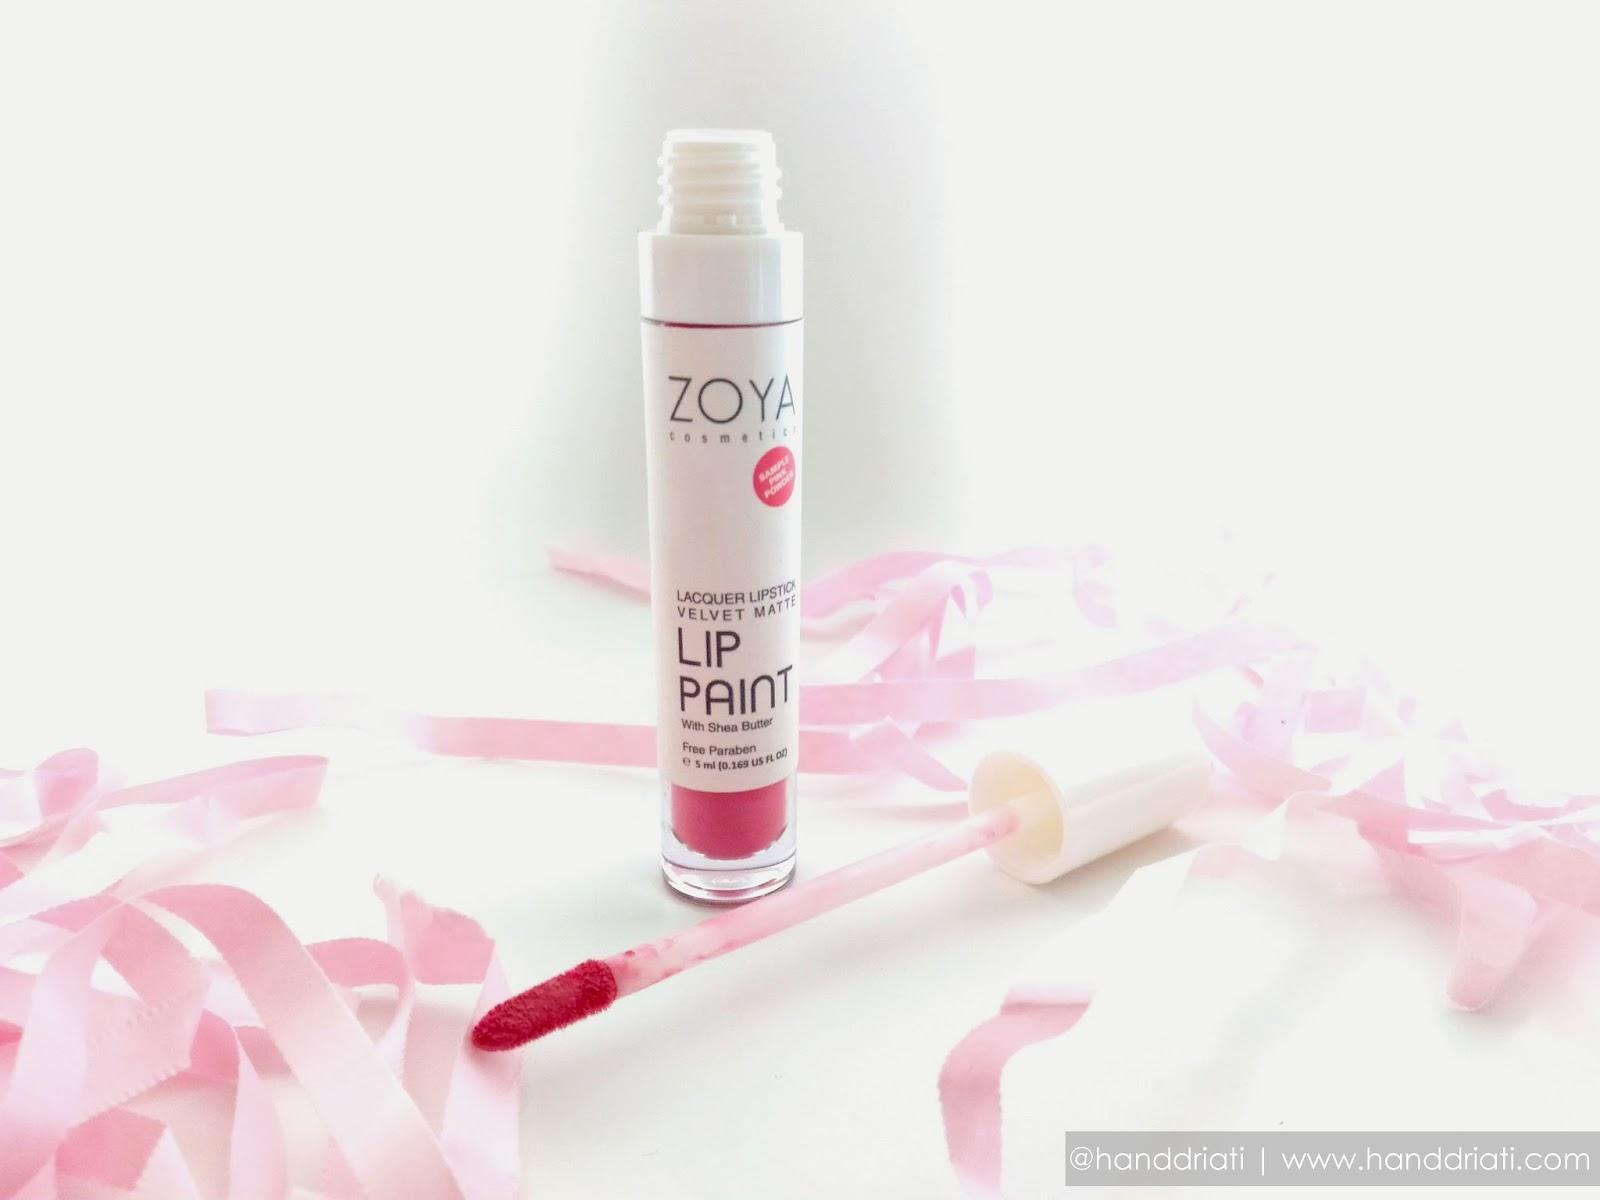 Review Zoya Lacquer Velvet Matte Lip Paint With Shea Butter Cosmetics Beautynesia